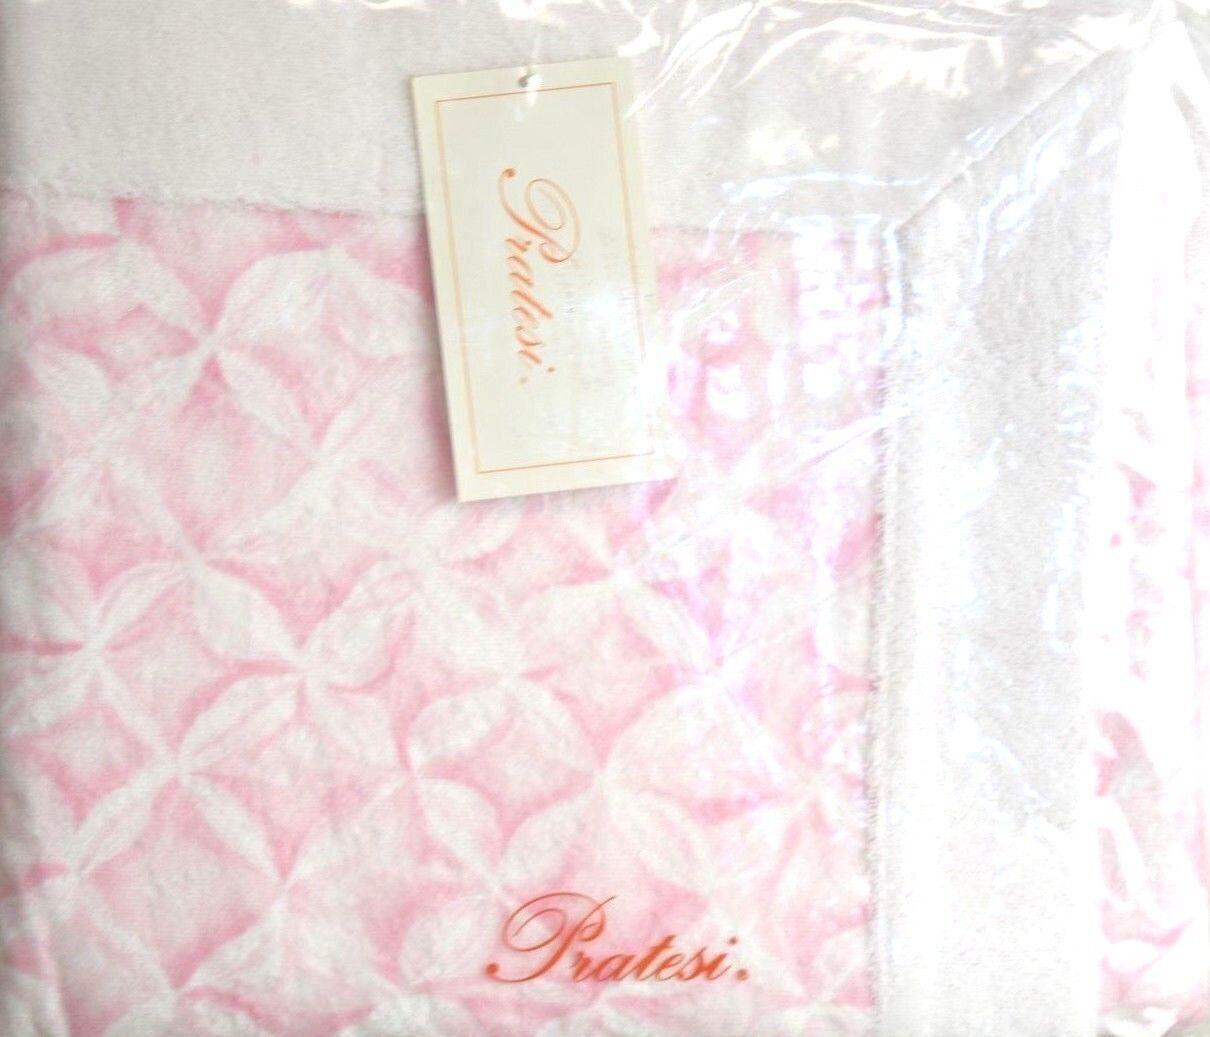 NEW PRATESI Ice Home White Pink BATH SHEET TOWEL BATH MAT 23